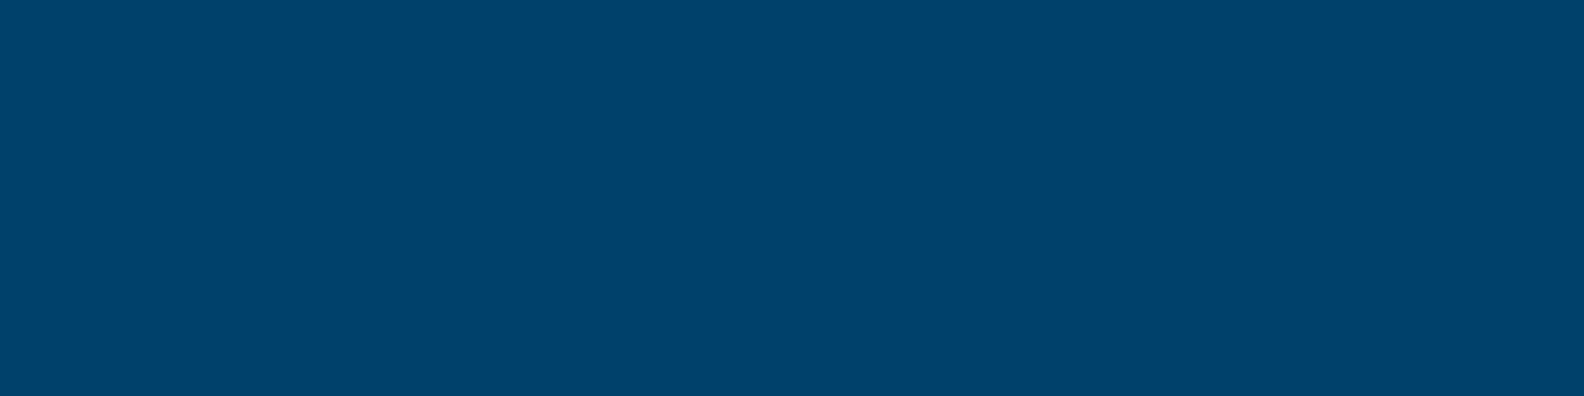 1584x396 Indigo Dye Solid Color Background